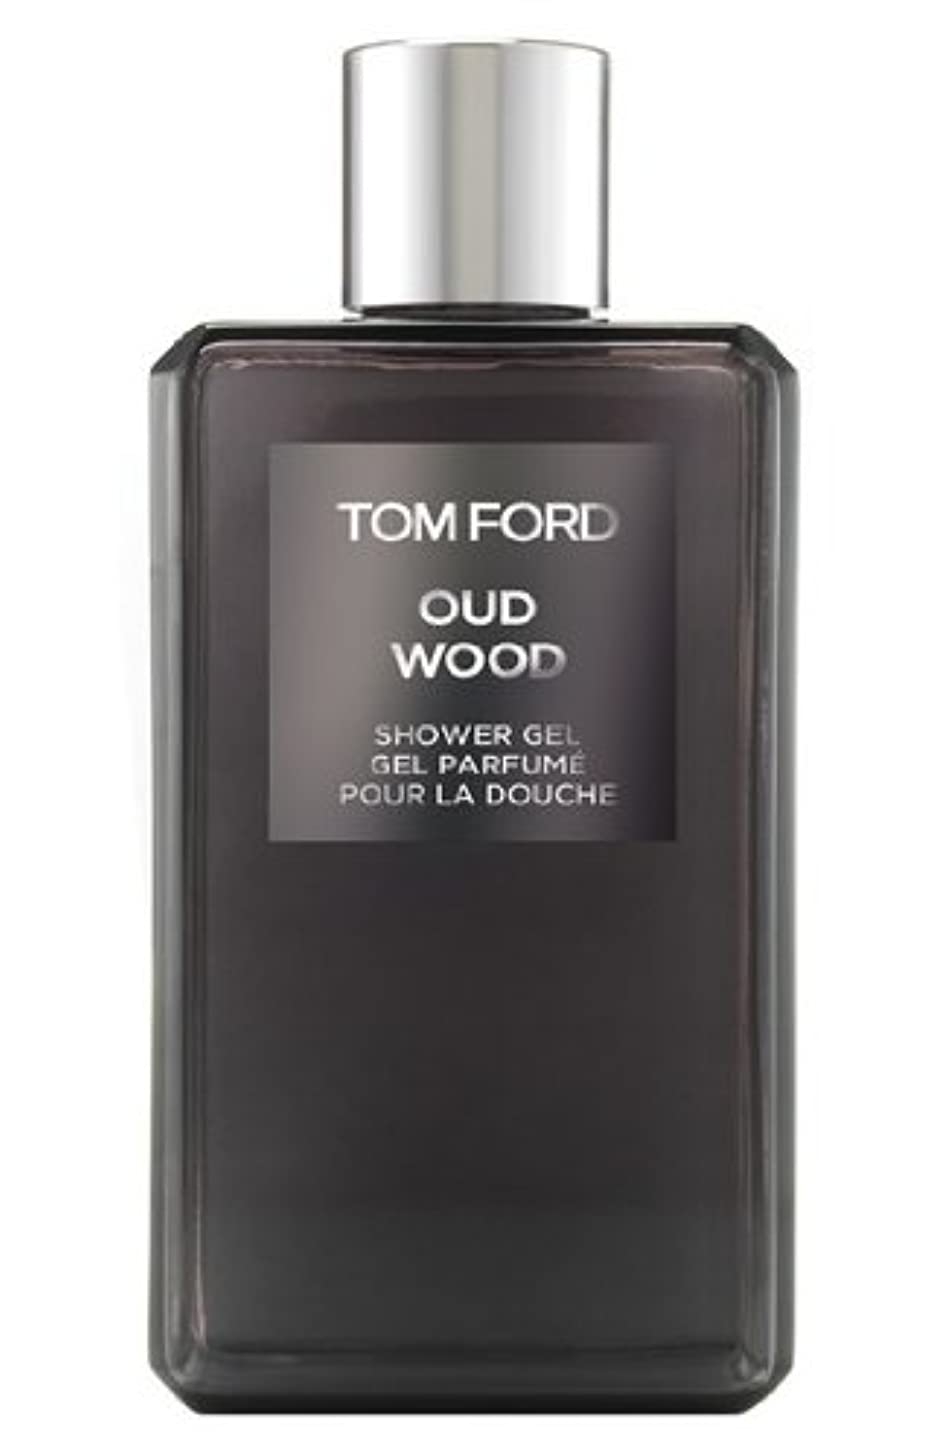 Tom Ford Private Blend 'Oud Wood' (トムフォード プライベートブレンド オードウッド) 8.45 oz (254ml) Shower Gel